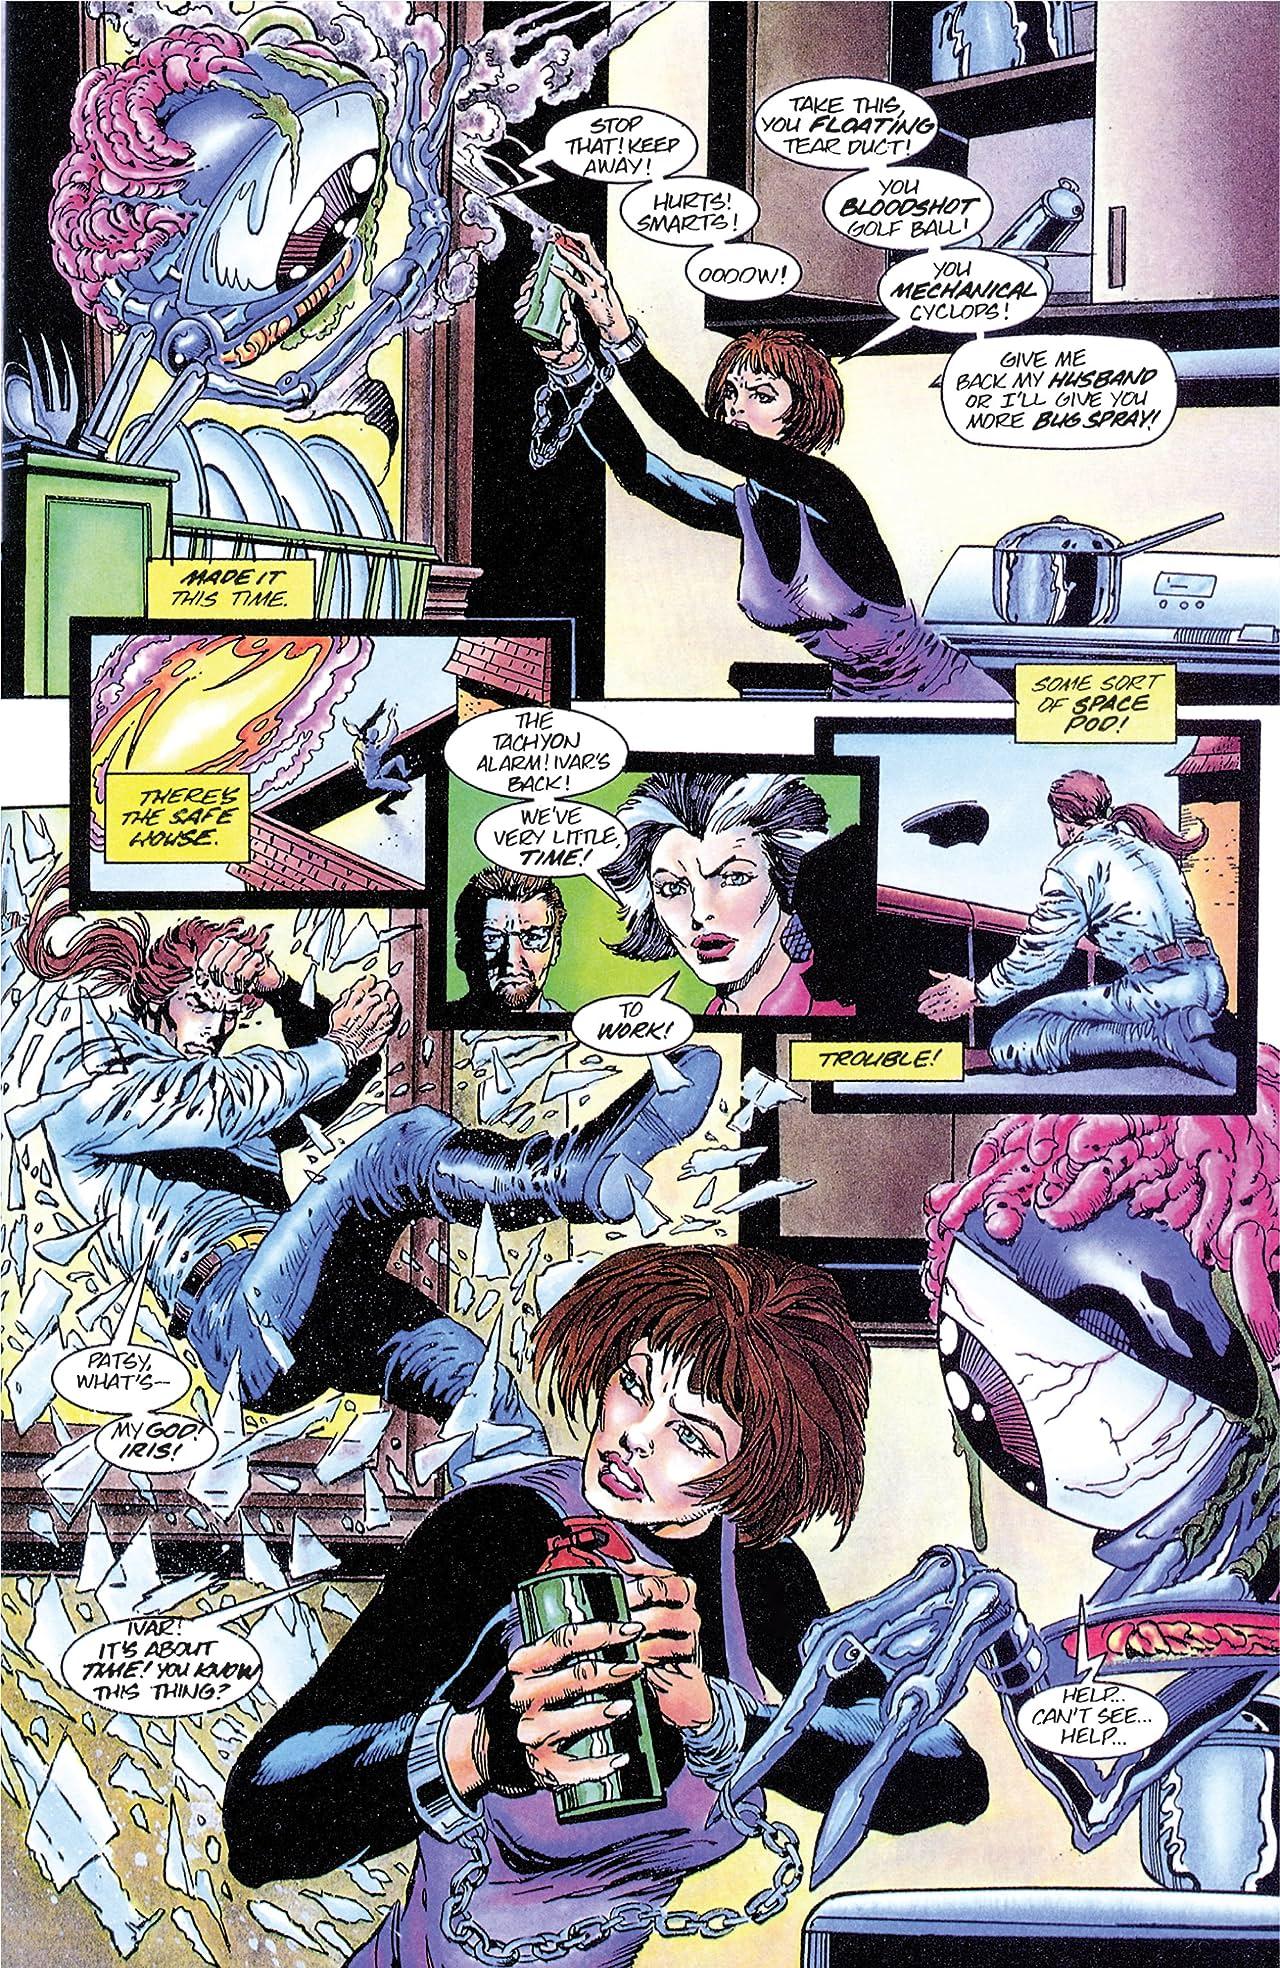 Timewalker (1994) #9